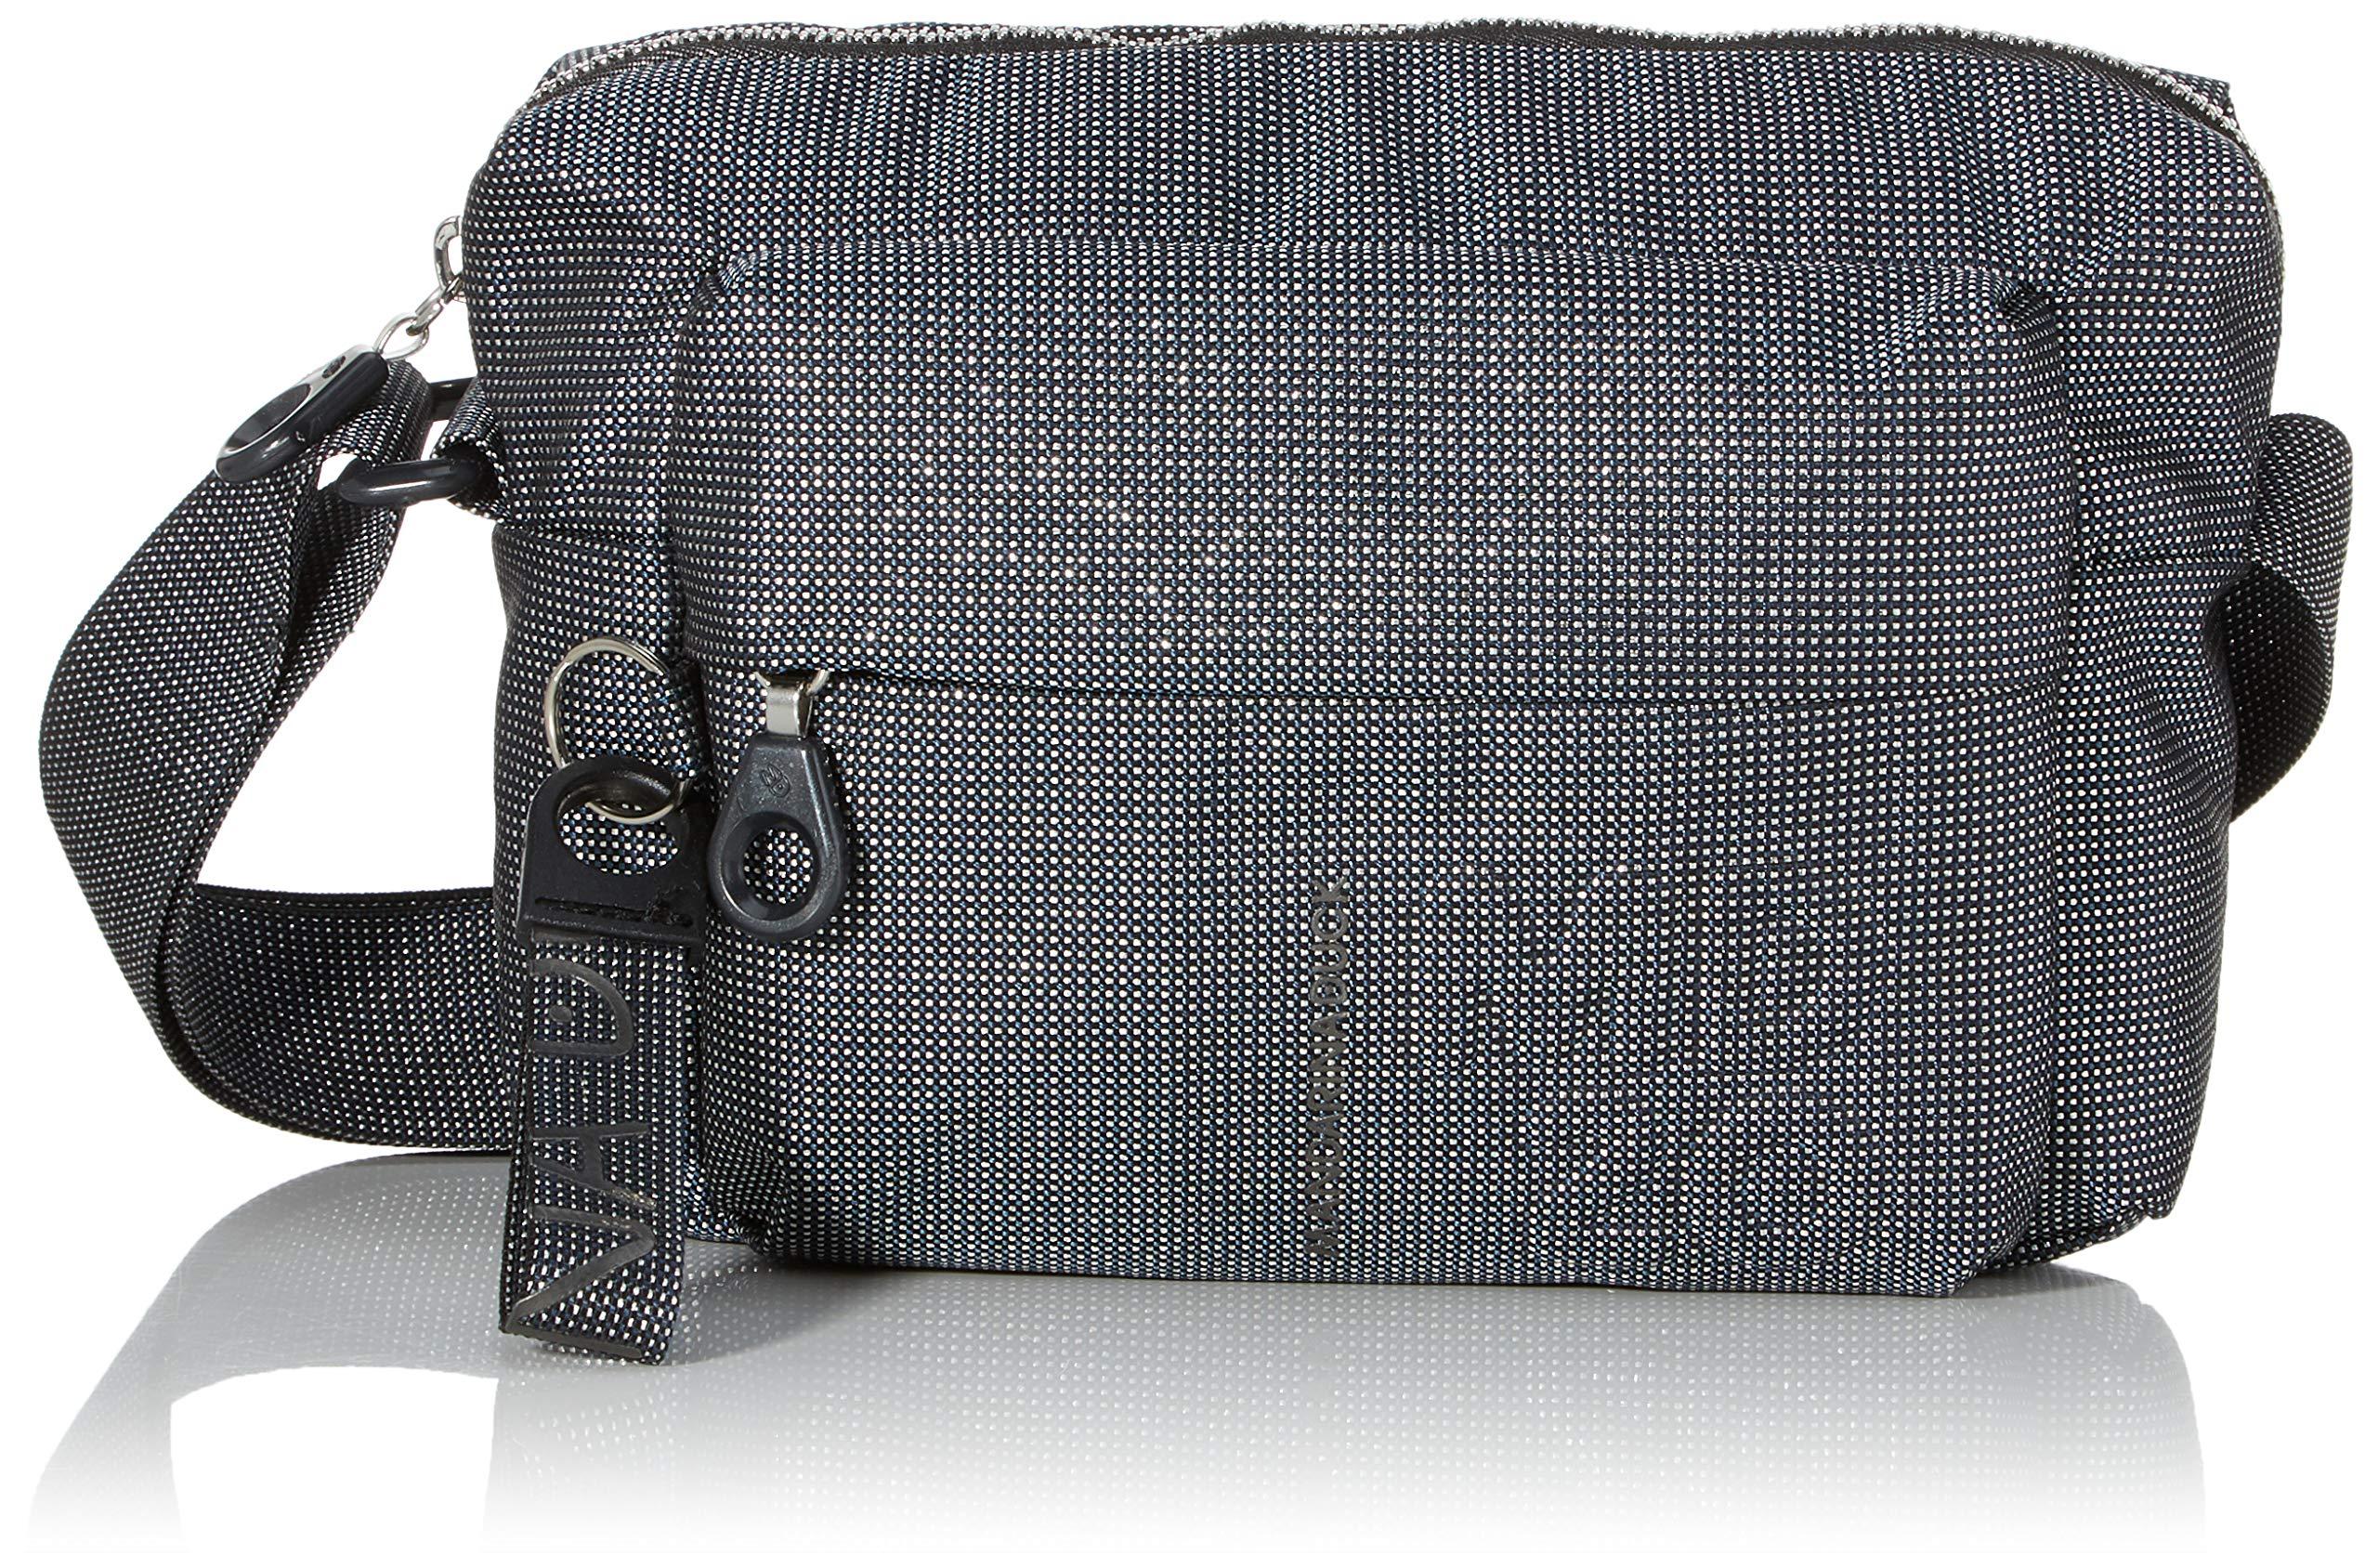 Mandarina Duck Handtaschen Taschen NTT7 titanium Metallic xq3va